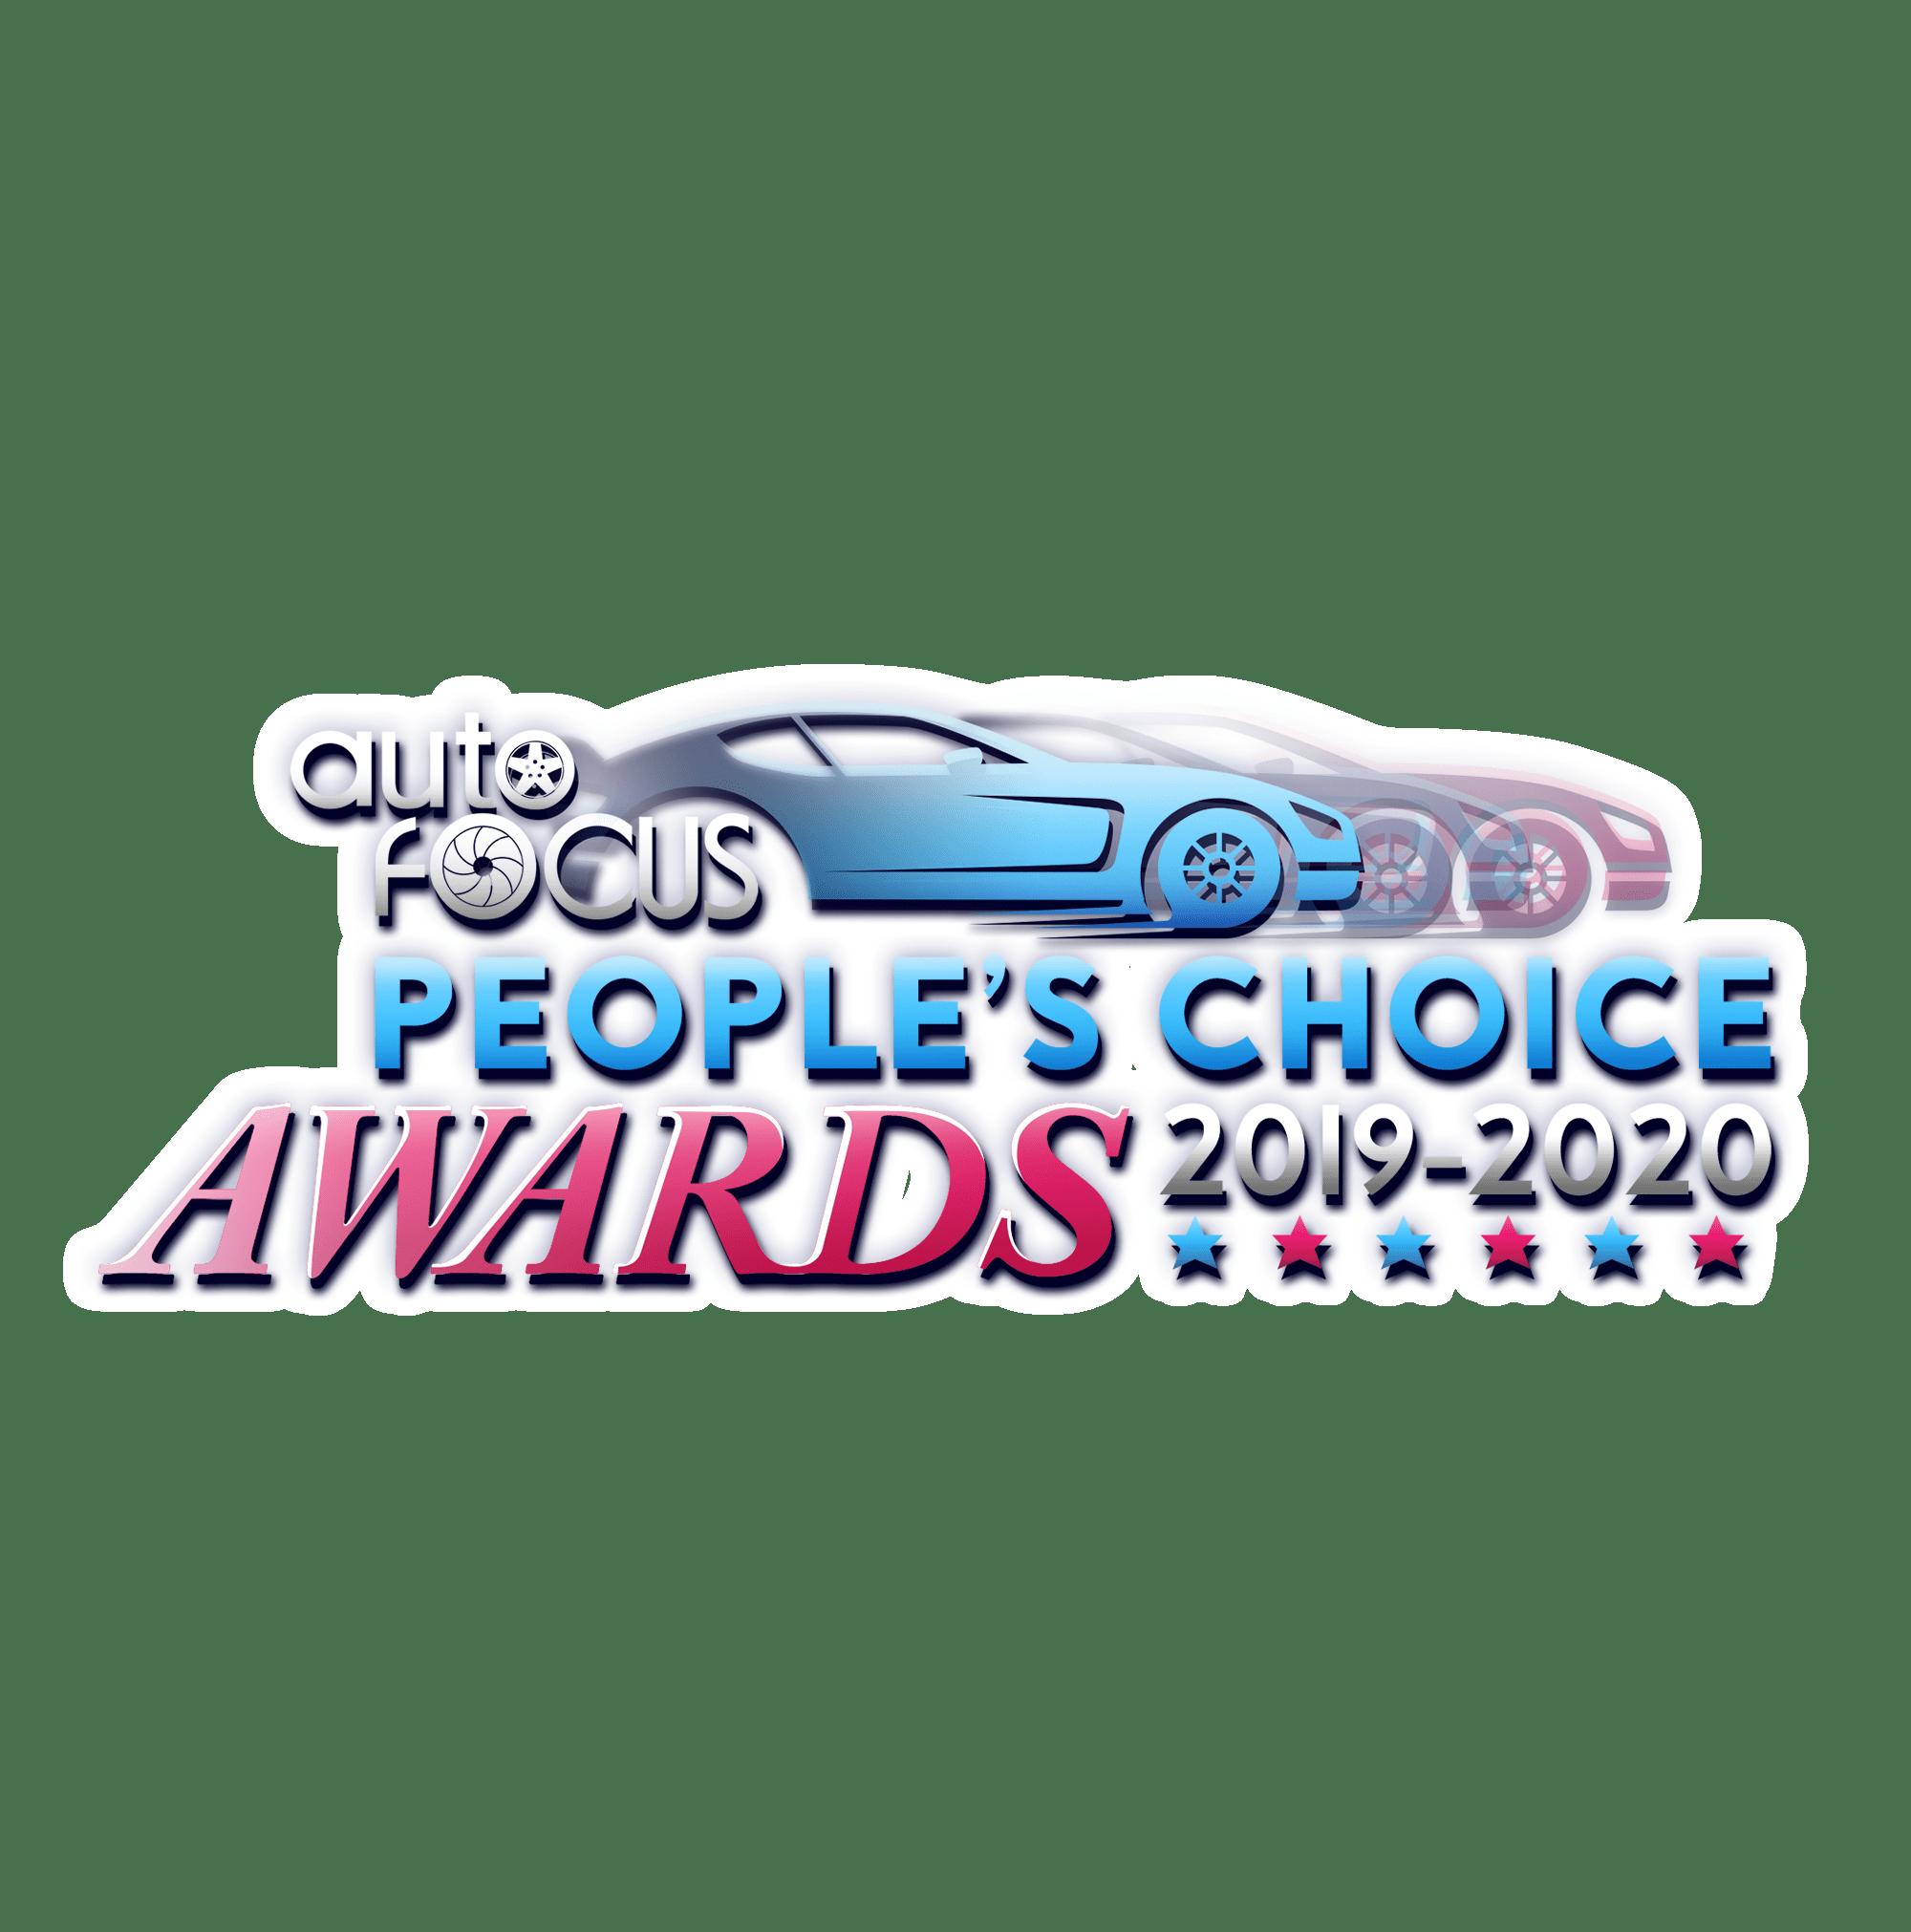 Mitsubishi Xpander, Toyota Alphard Top 2019-2020 Auto Focus People's Choice Awards